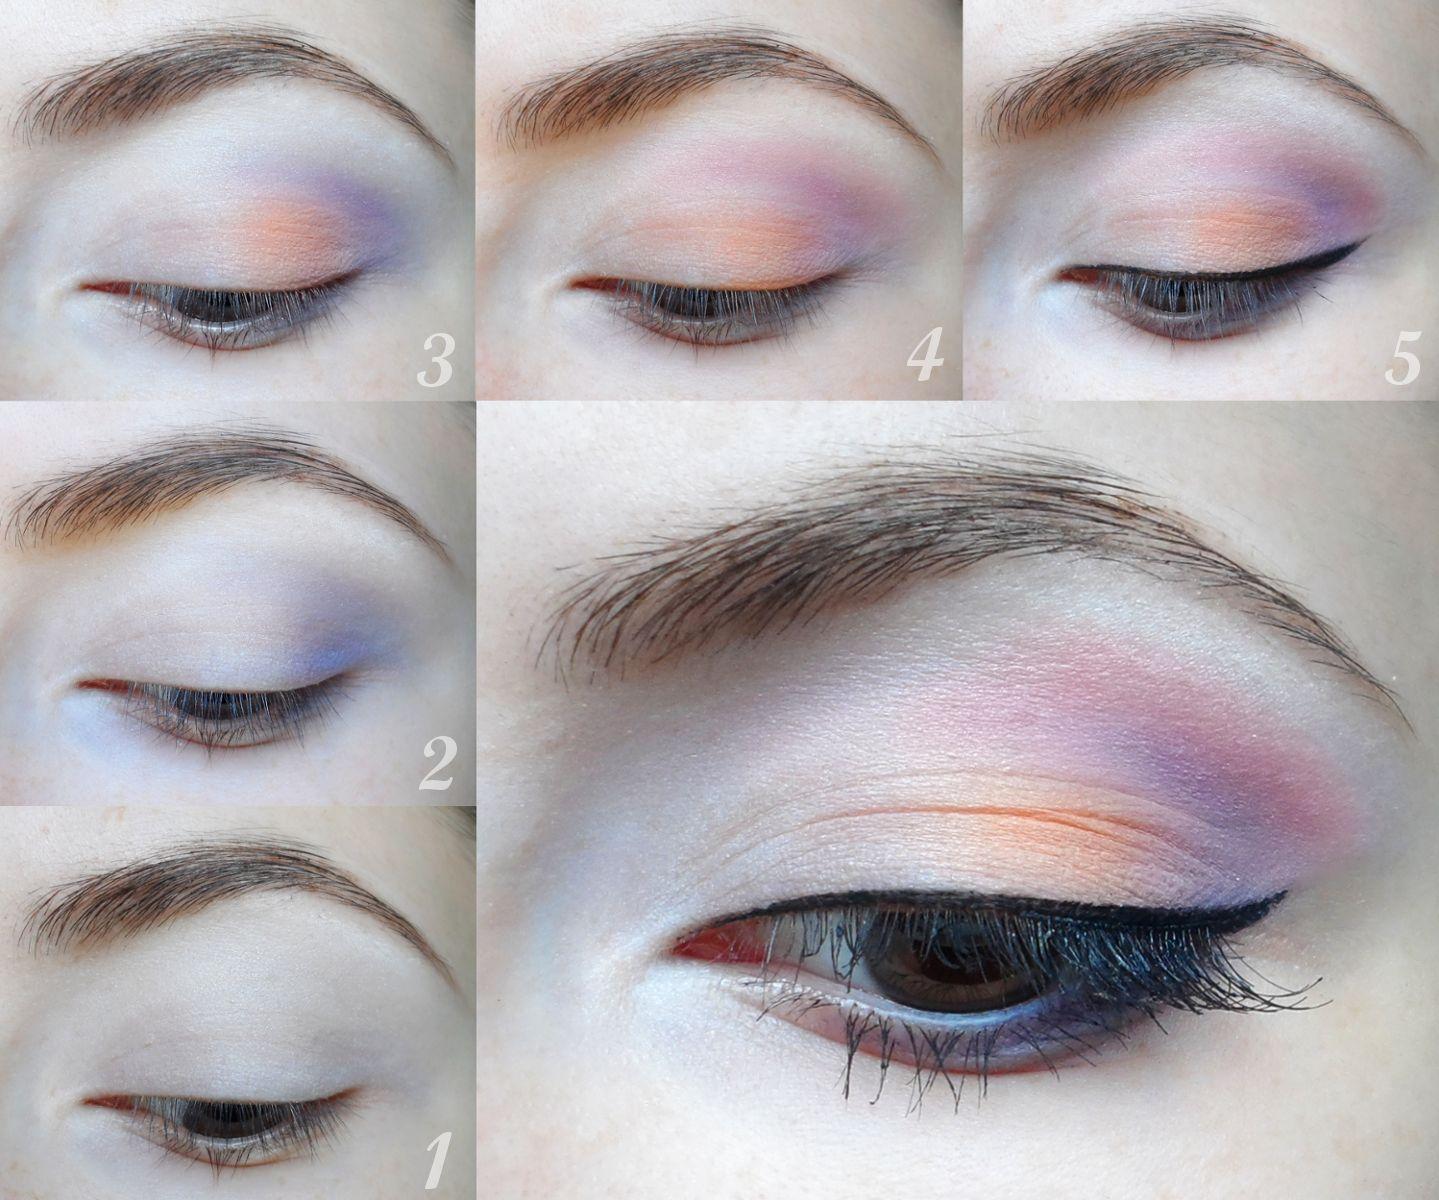 Springeyeshadowstepbysteptutorialpastelpink Summer Makeup Tutorialseye  Makeup